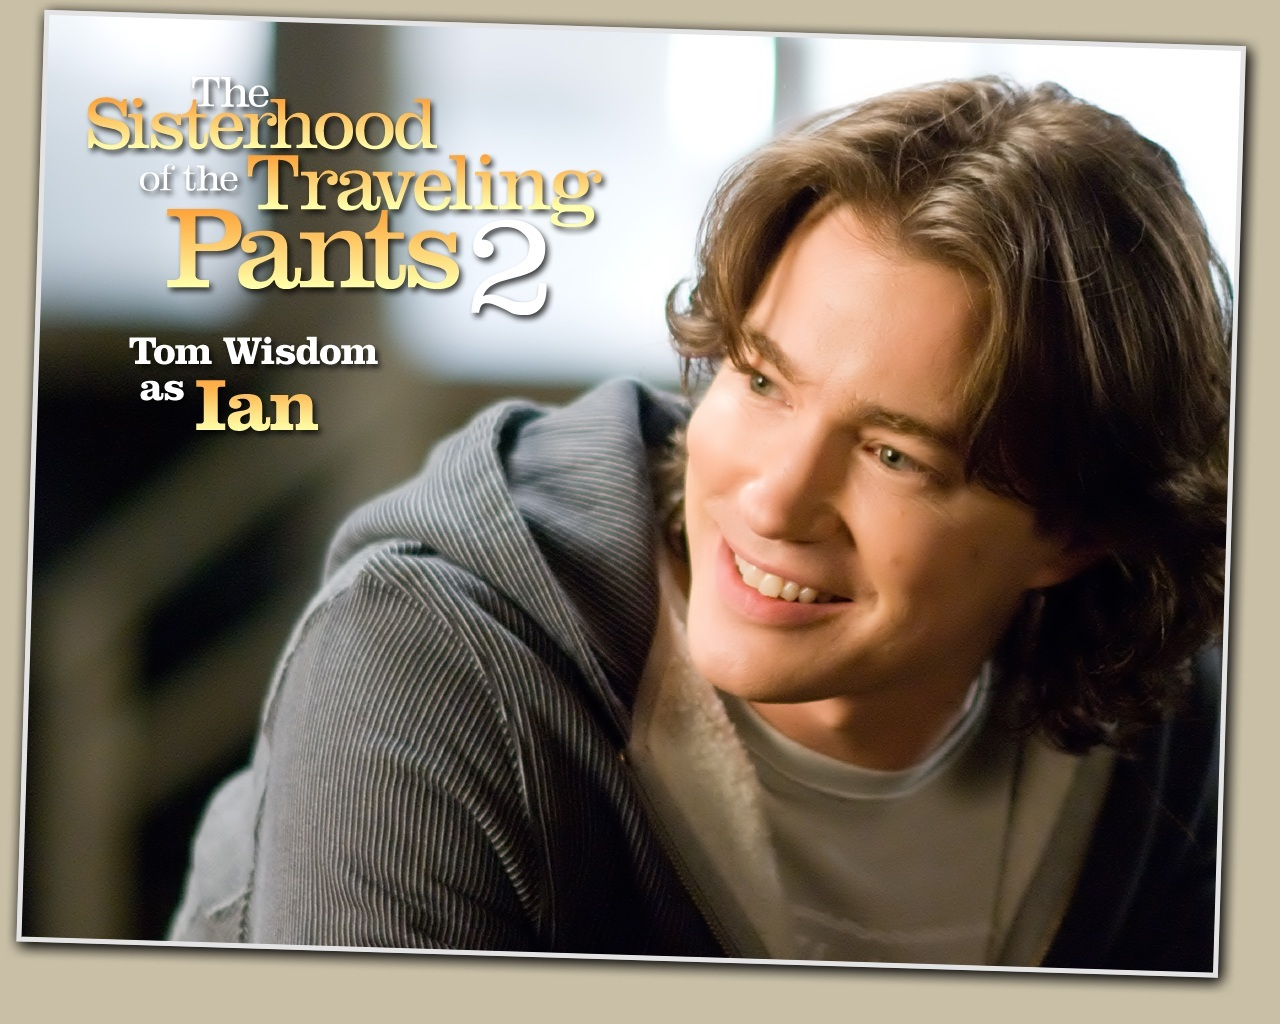 Tom Wisdom